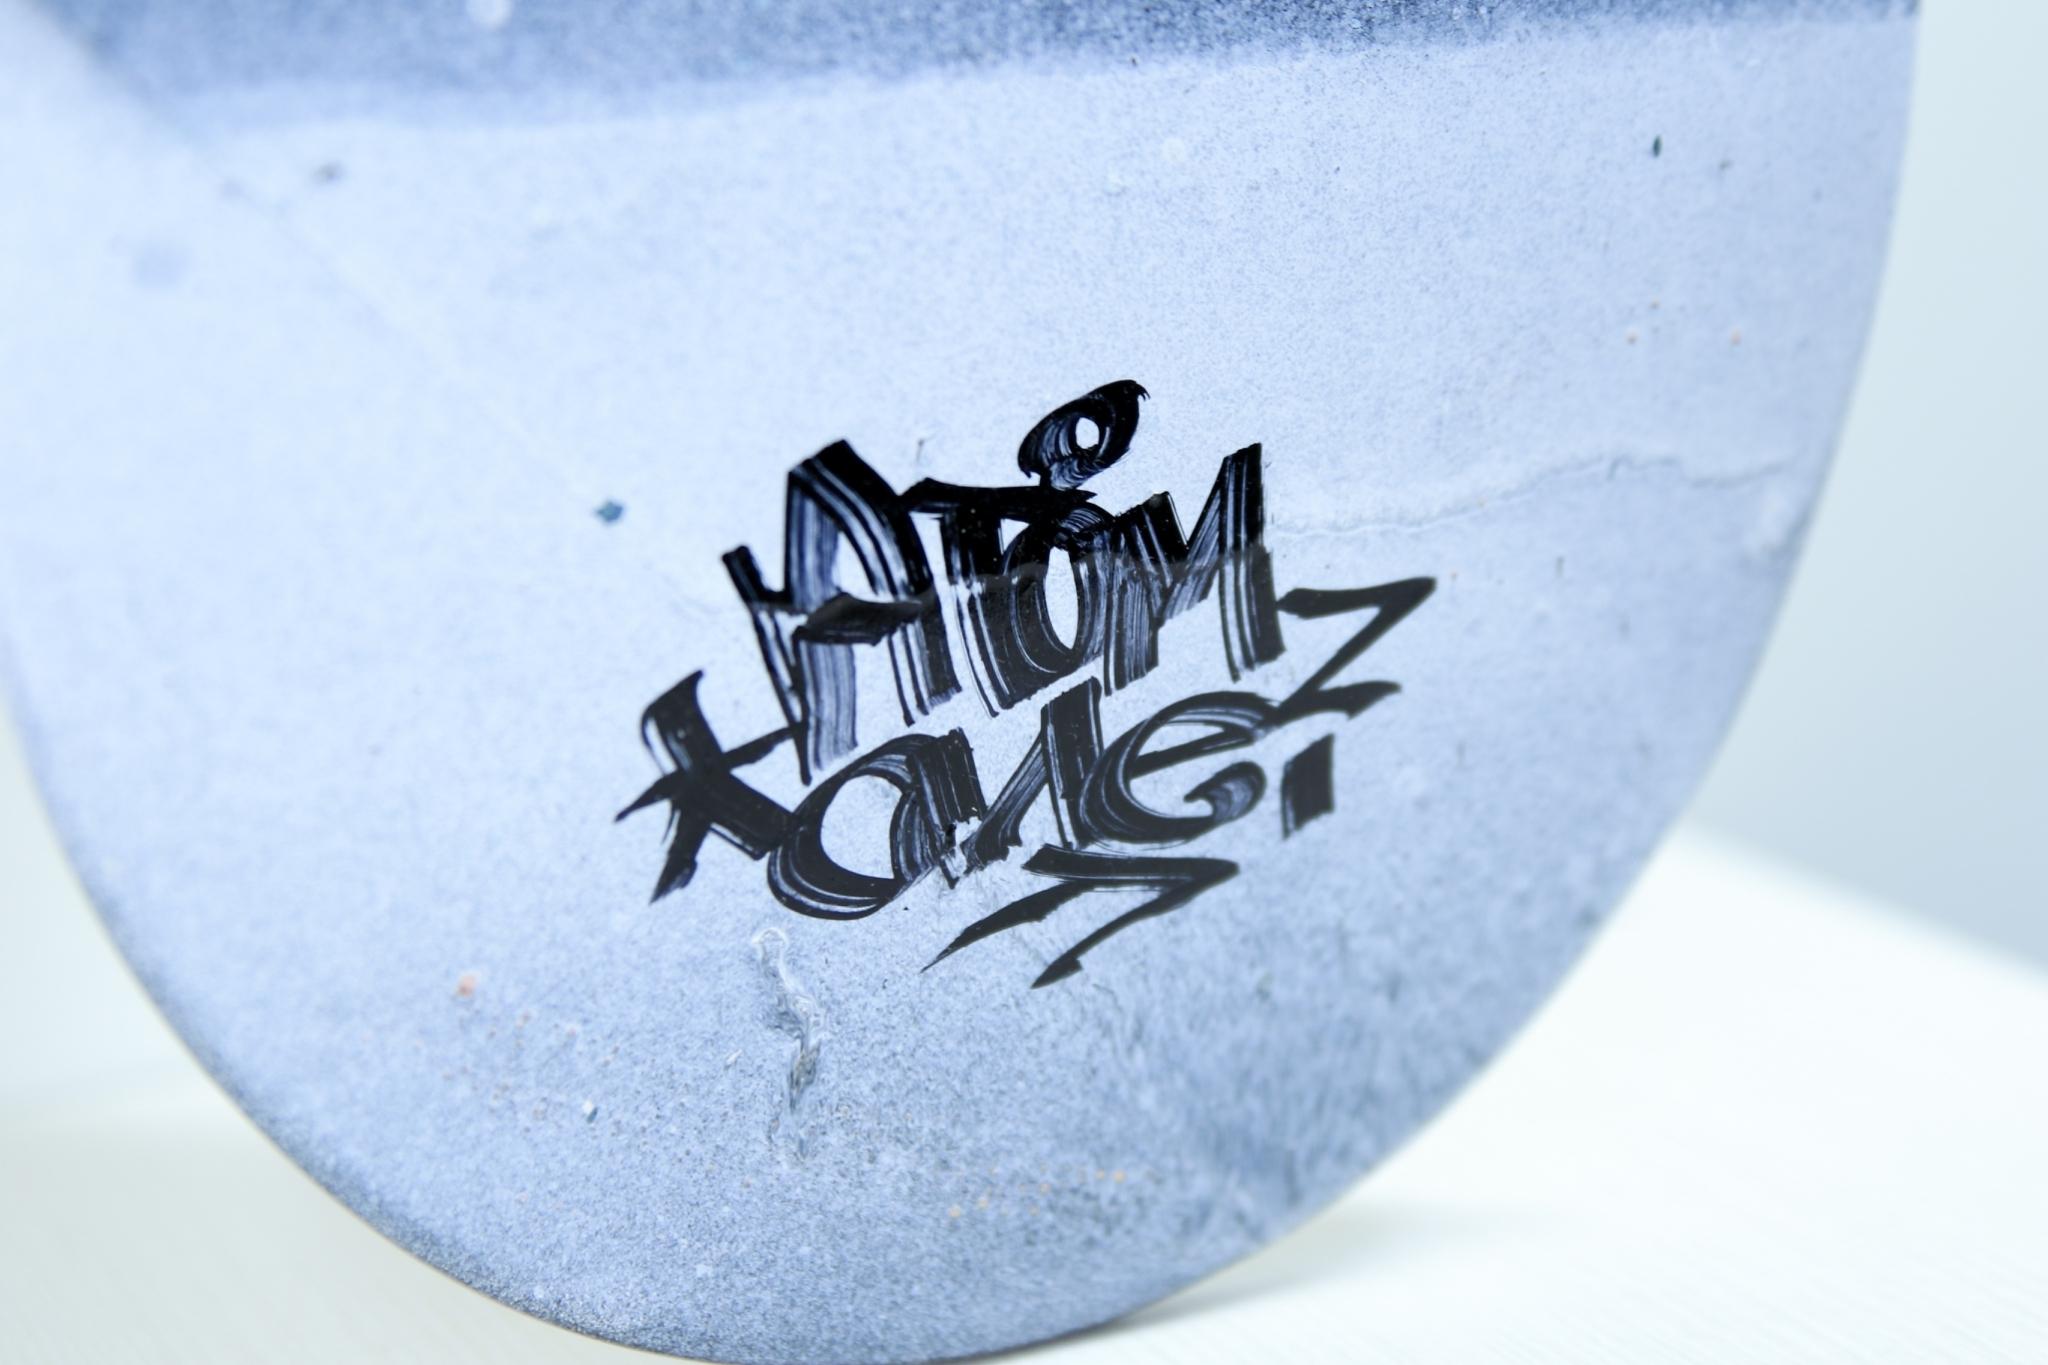 ZZSB Spray & Paint DECK 8.25 [ ATOMONE ]